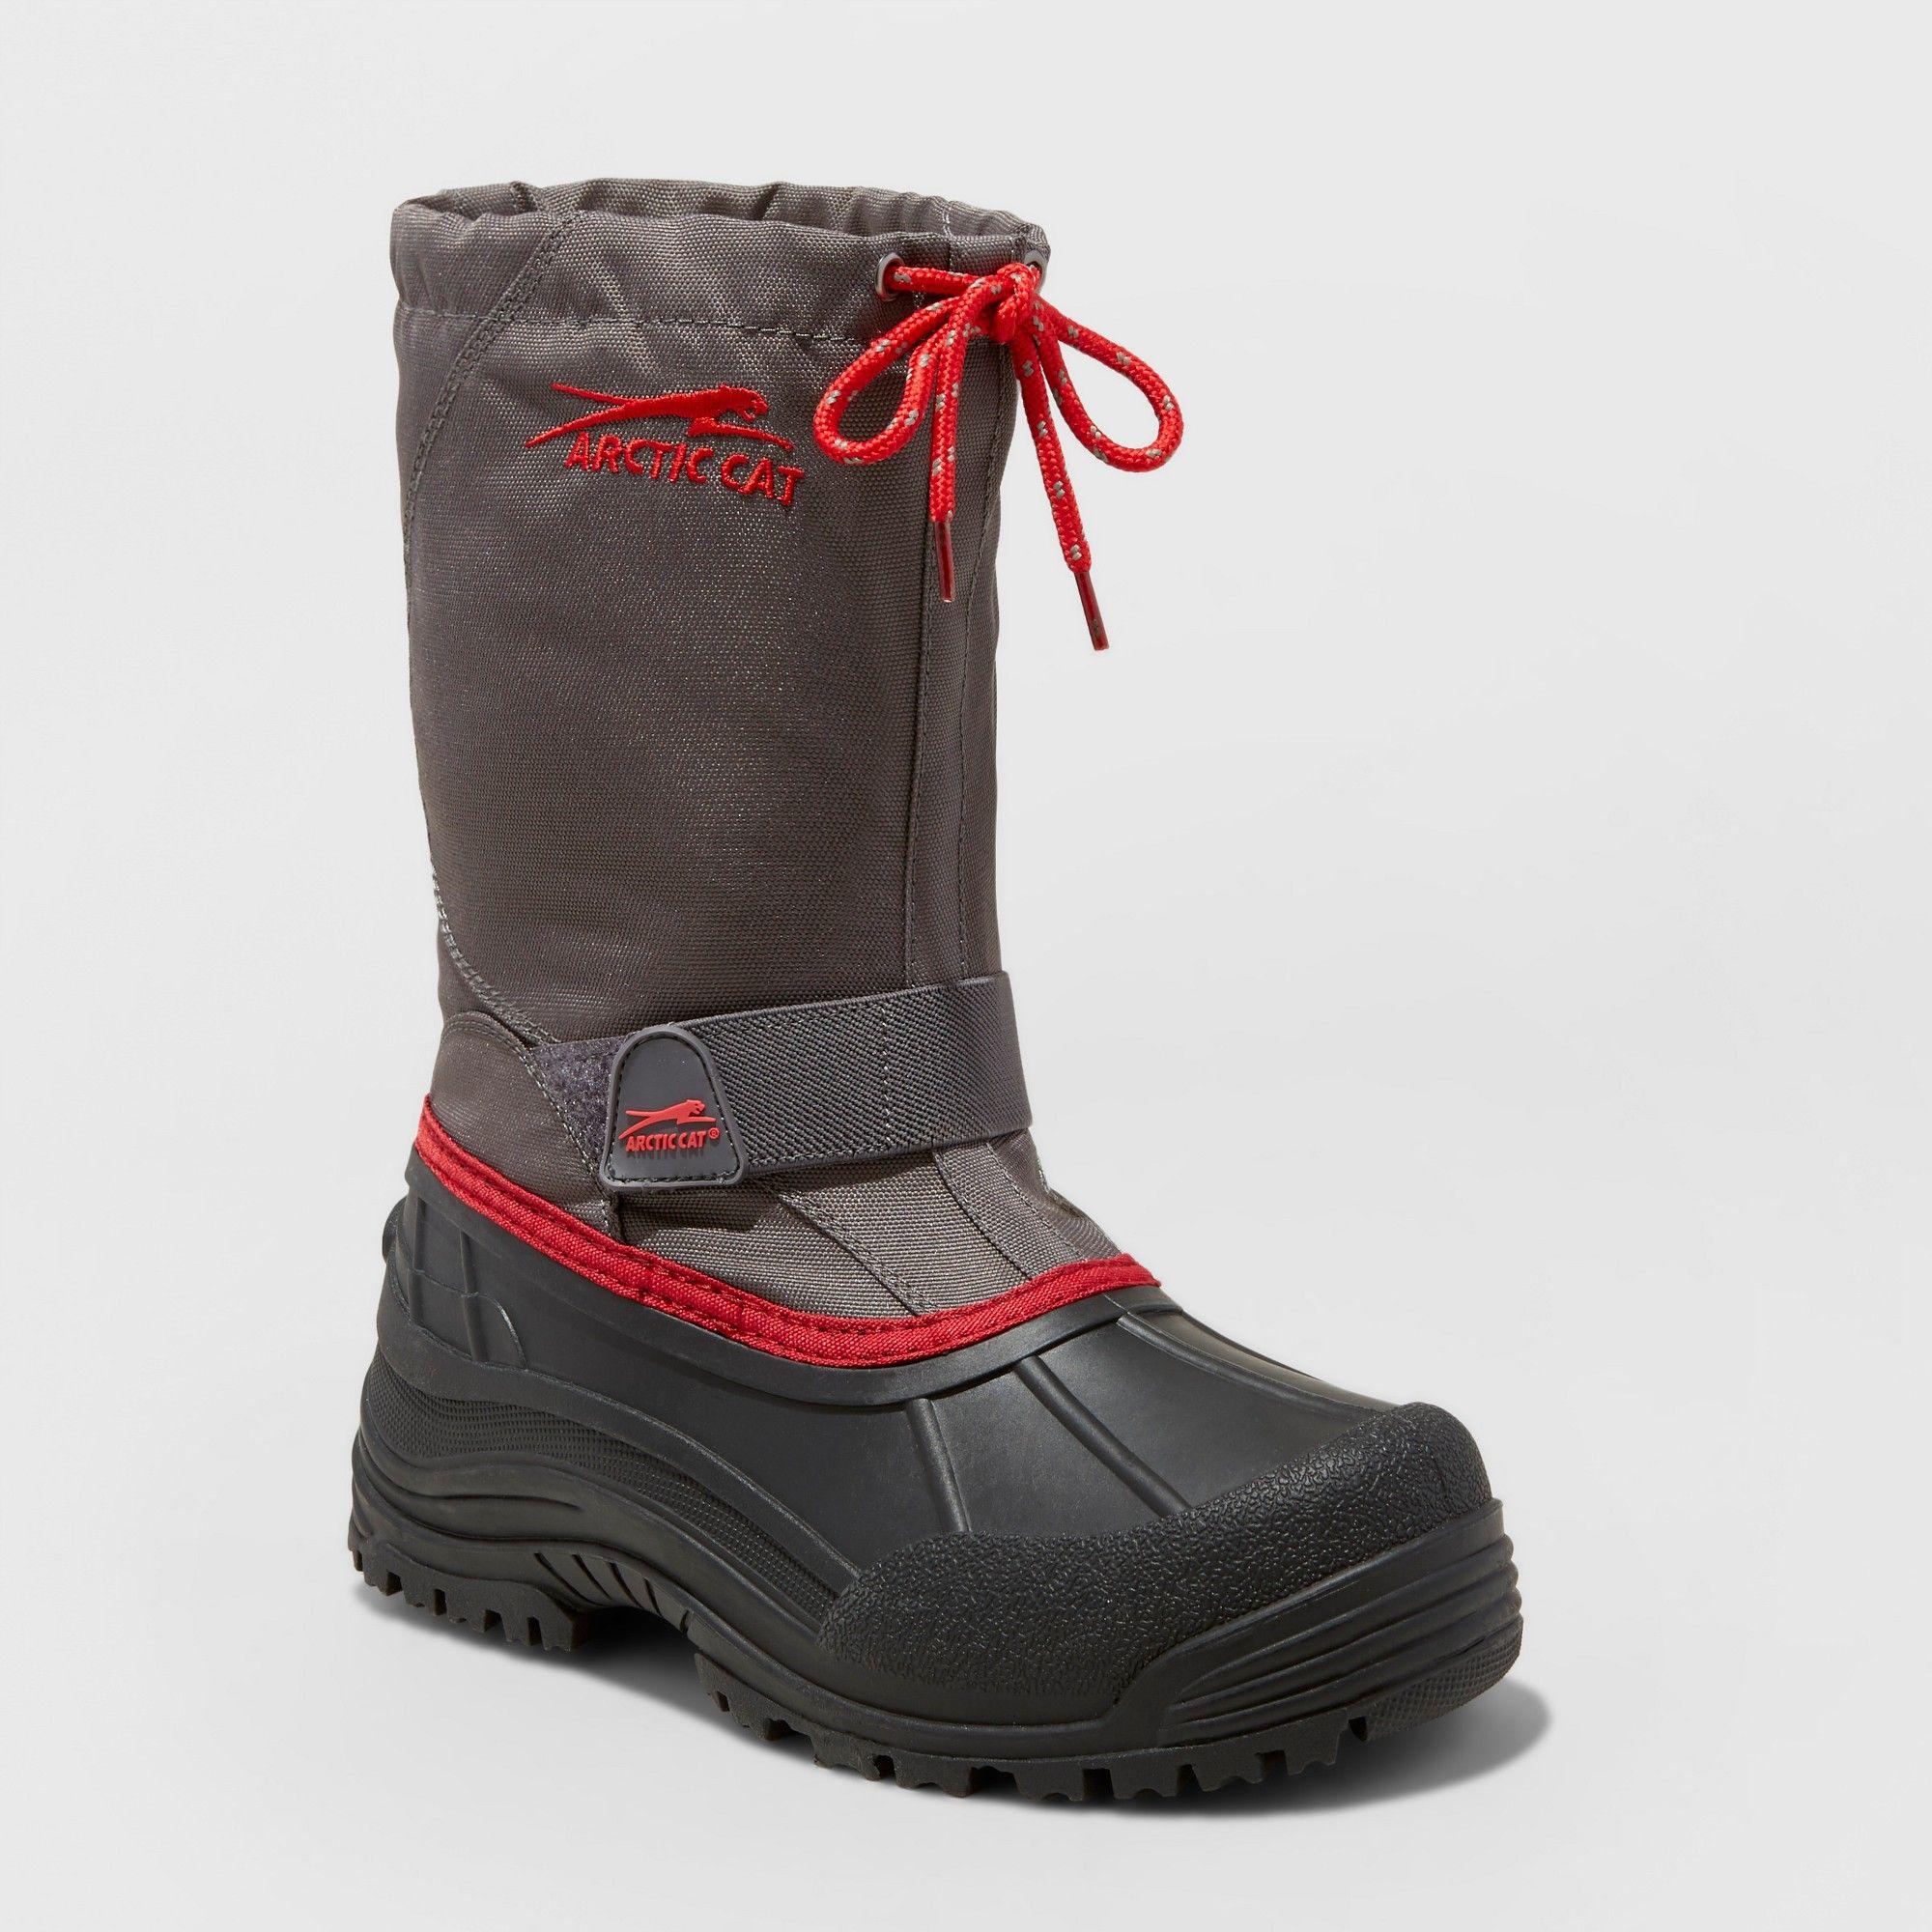 5bef6753b379 Boys  Arctic Cat Snowshower Winter Boots - Gray 2